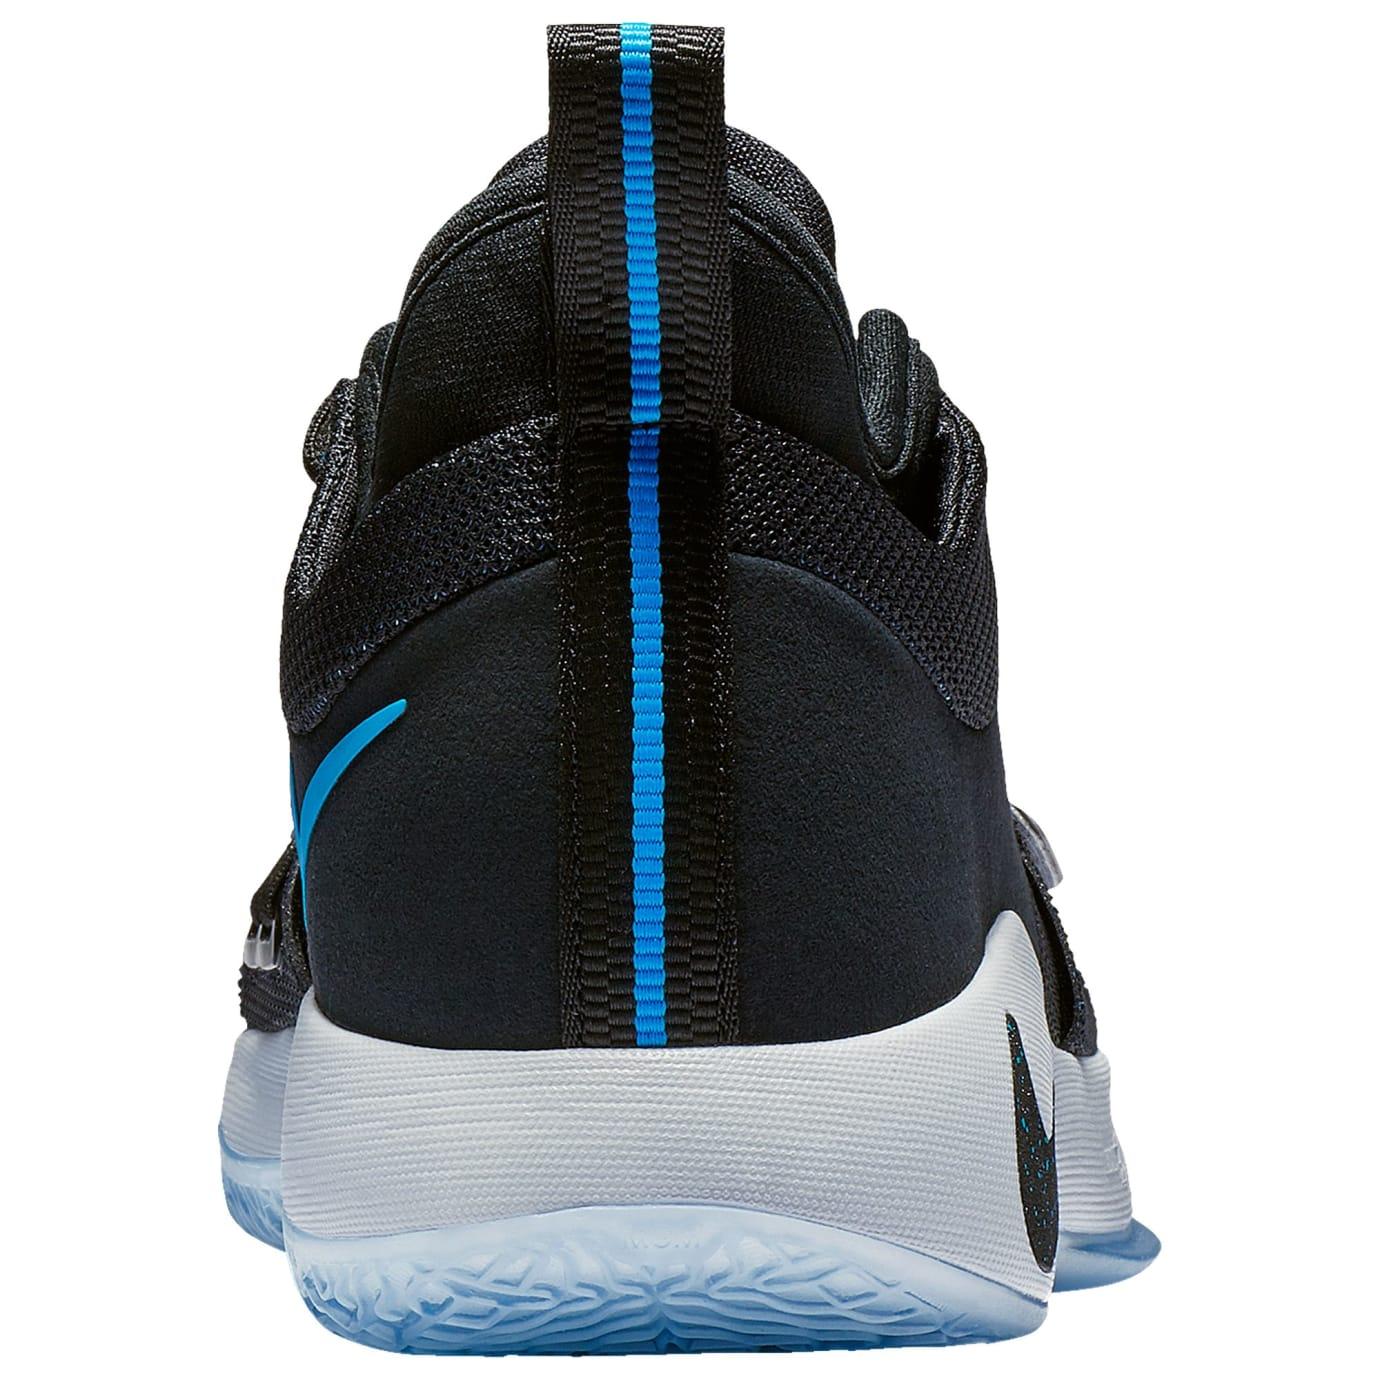 ef211a8cf64fa3 ... Image 3aa5164 via Foot Locker Nike PG 2.5 Photo Blue Release Date  BQ8452-006 Heel ...